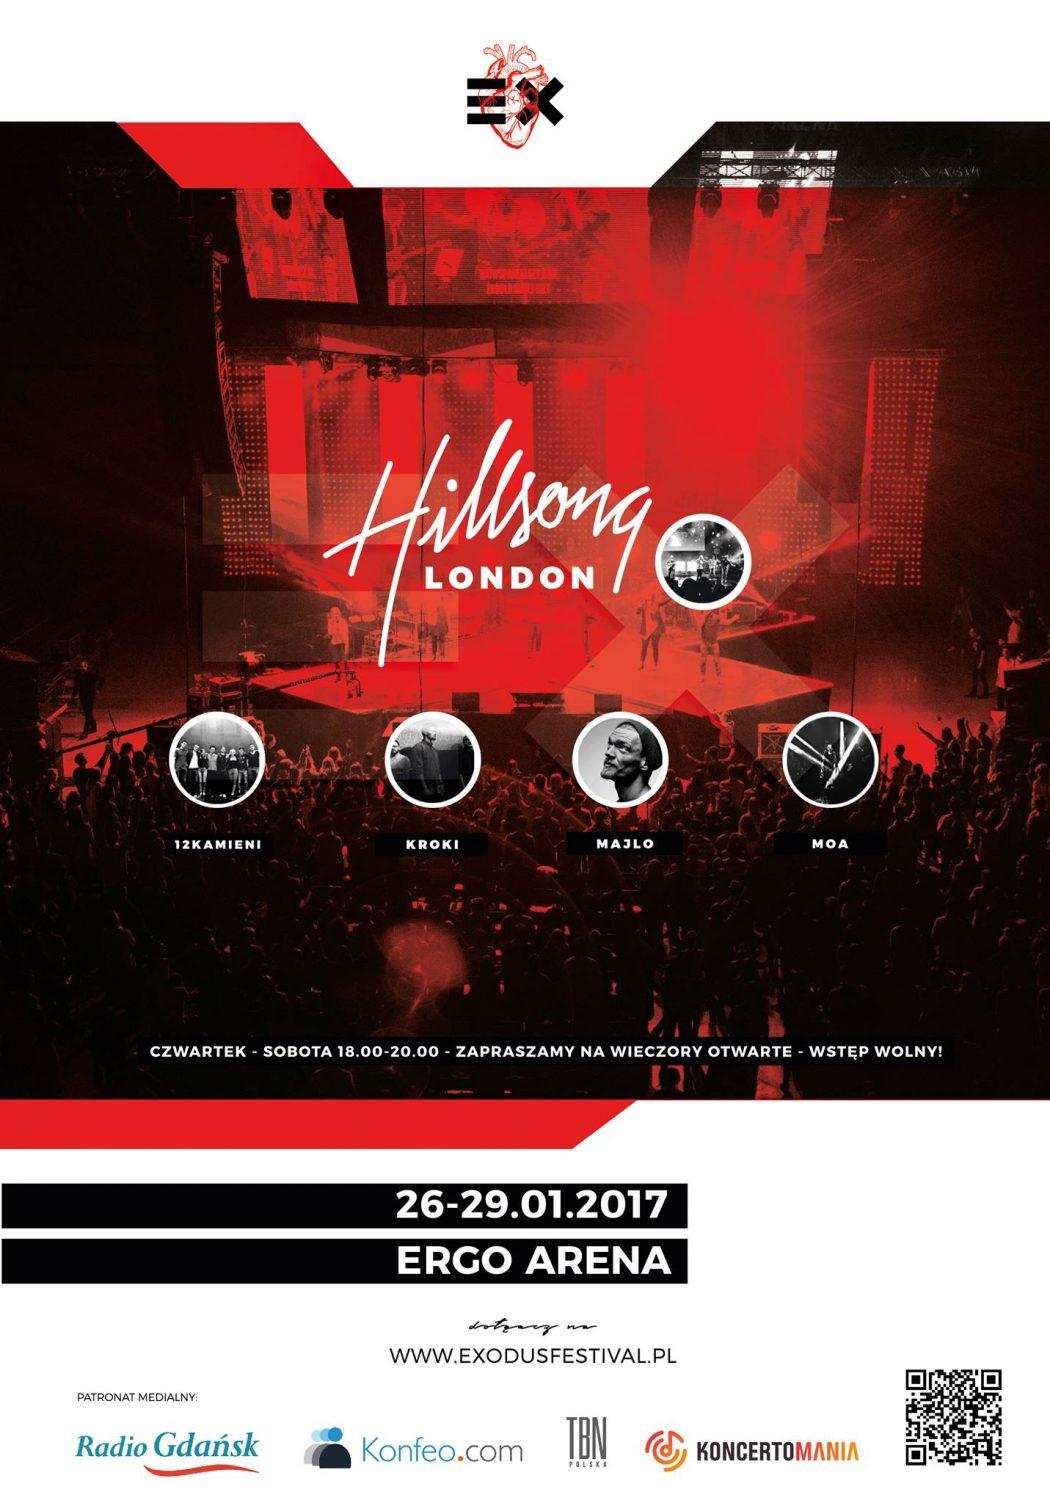 magazynkobiet.pl - Plakat EX17 1050x1503 - Koncert Hillsong London w ERGO ARENIE